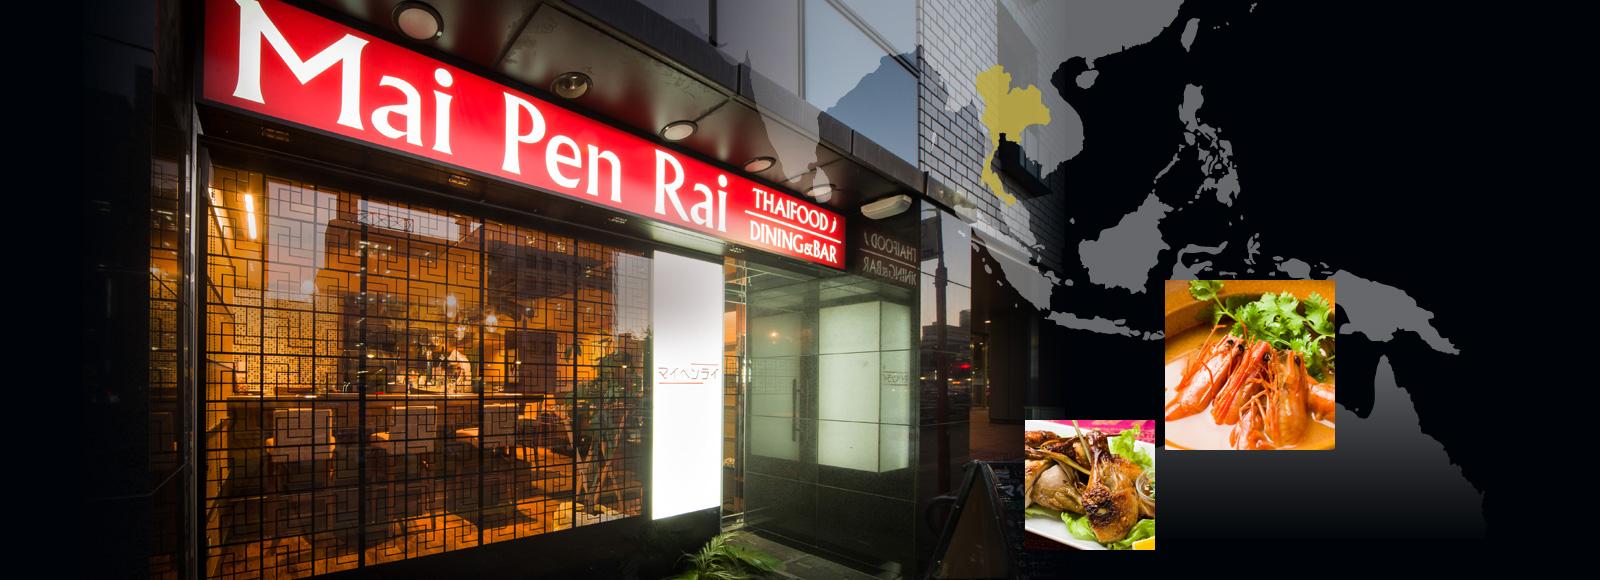 THAIFOOD・DINING&BAR マイペンライ